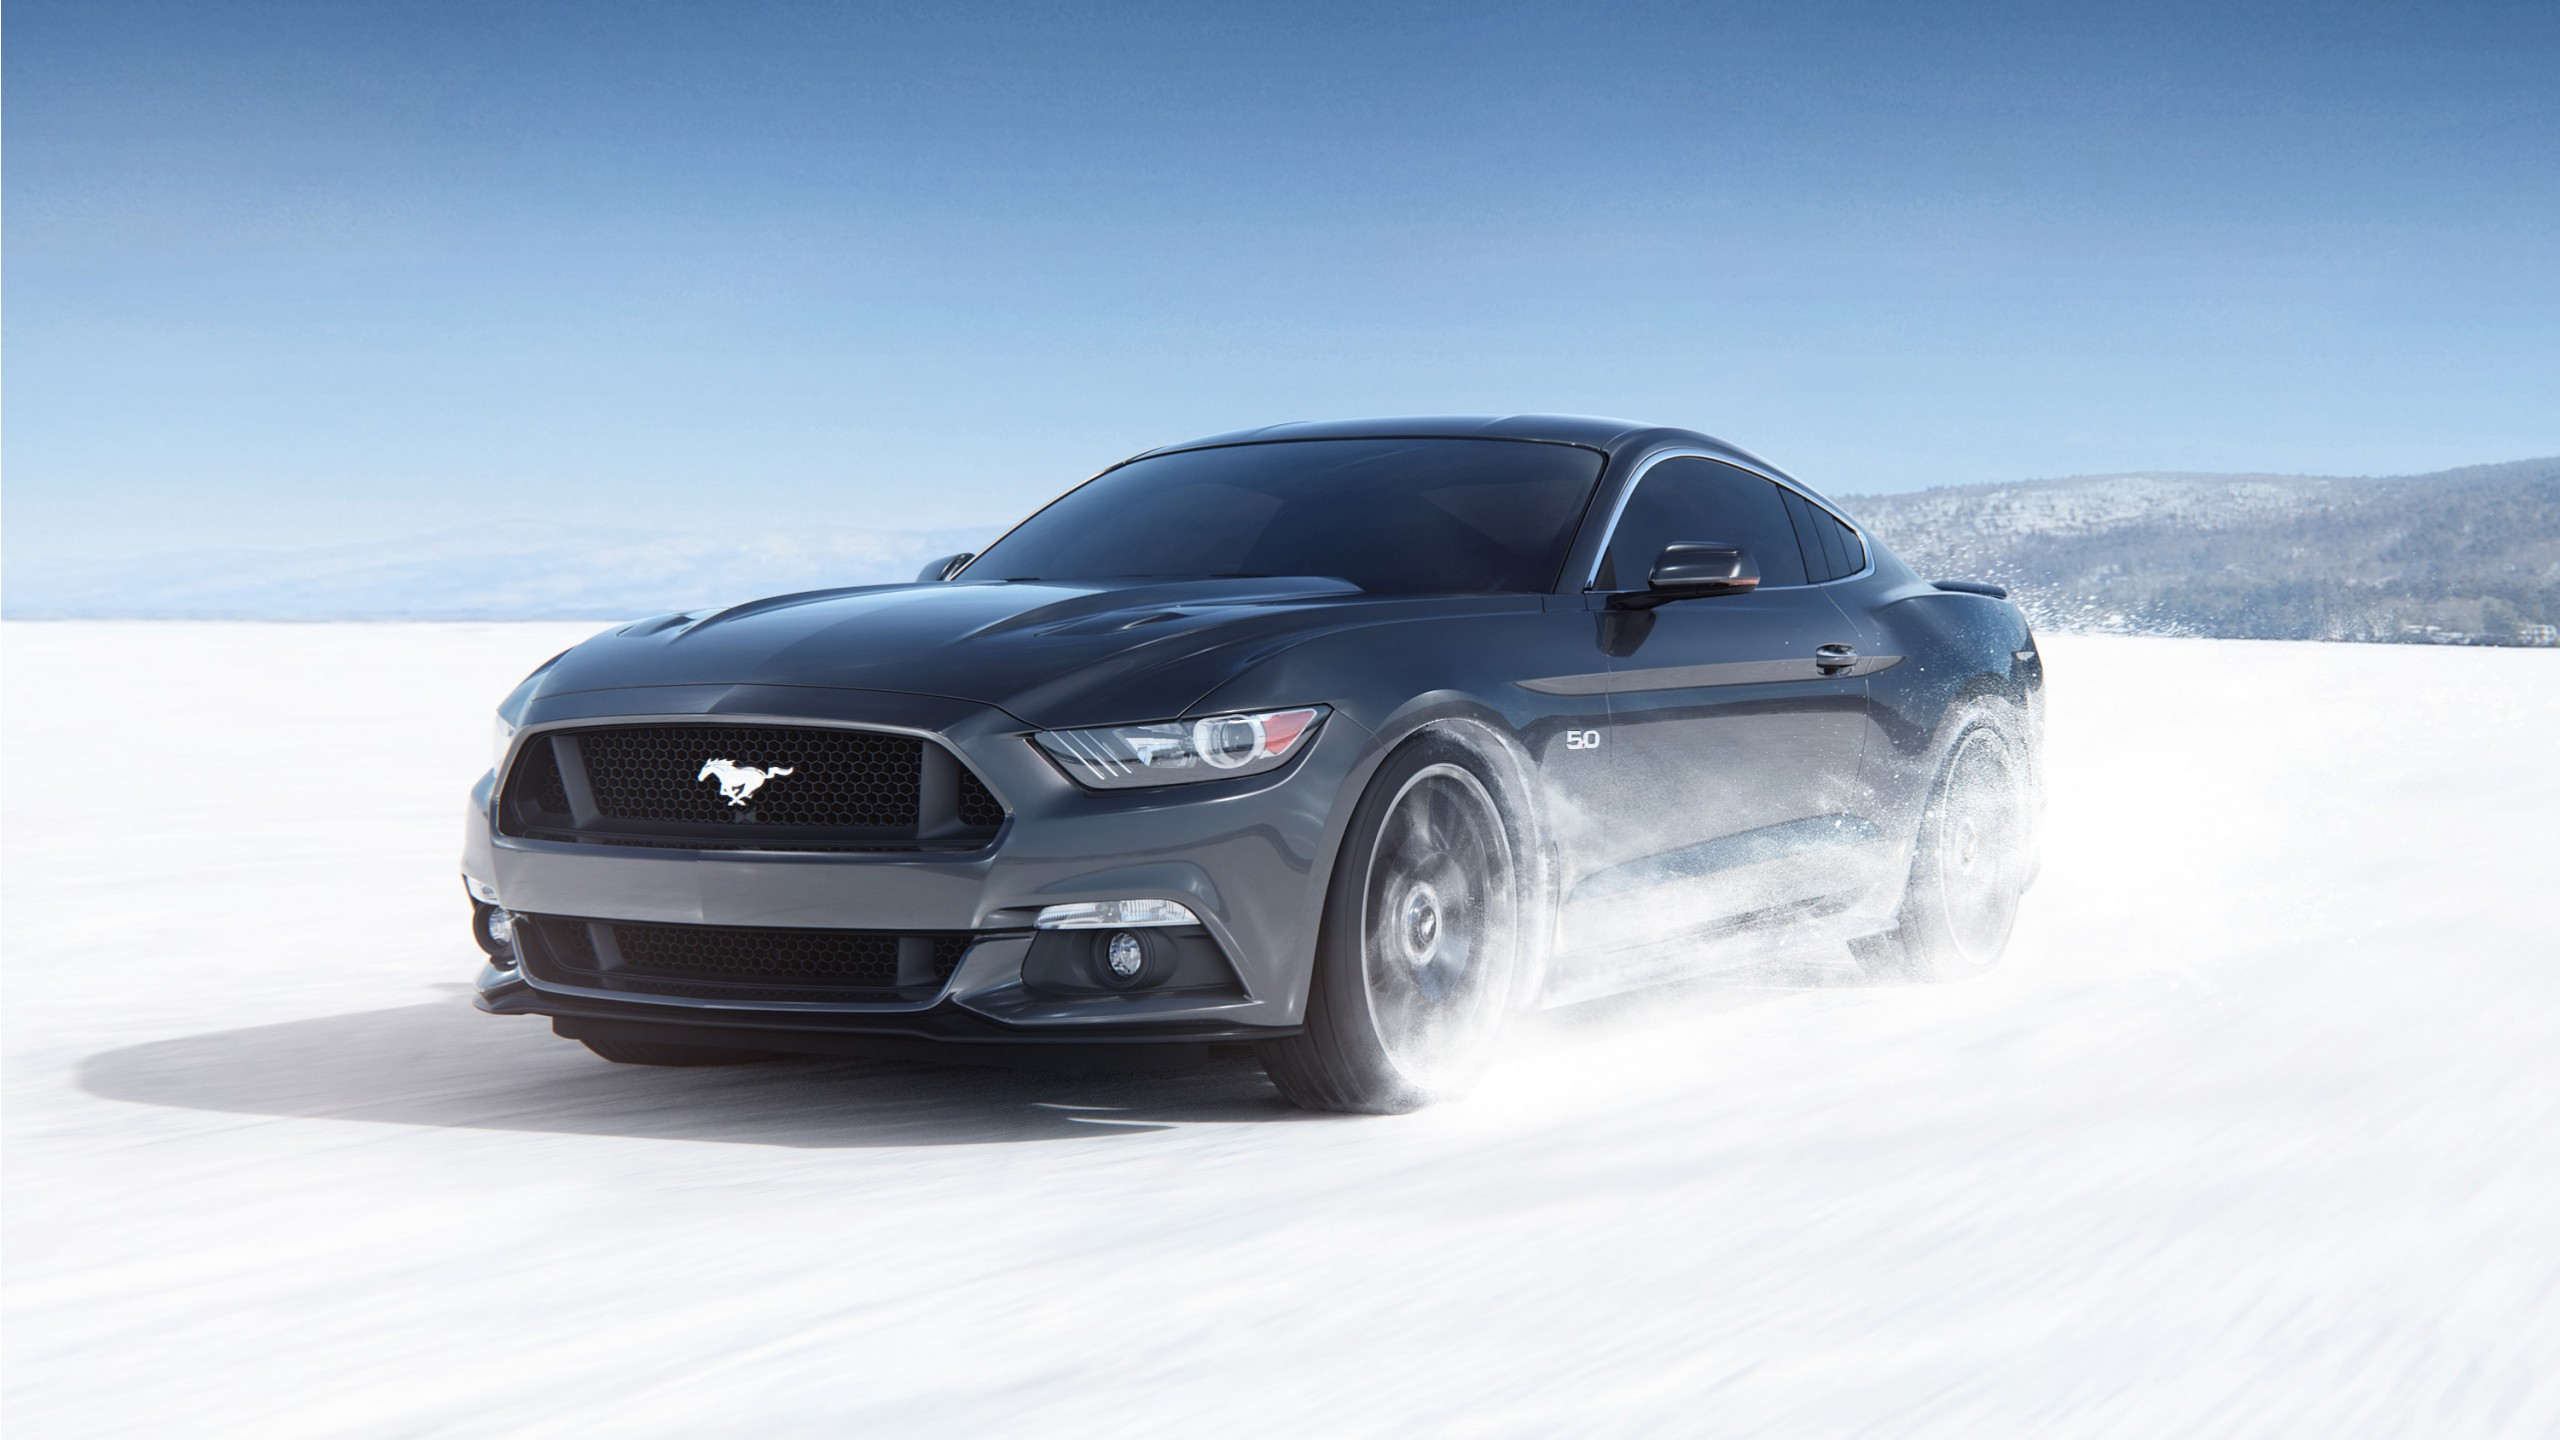 Ford Mustang 2018 4K Wallpaper | HD Car Wallpapers | ID #9089